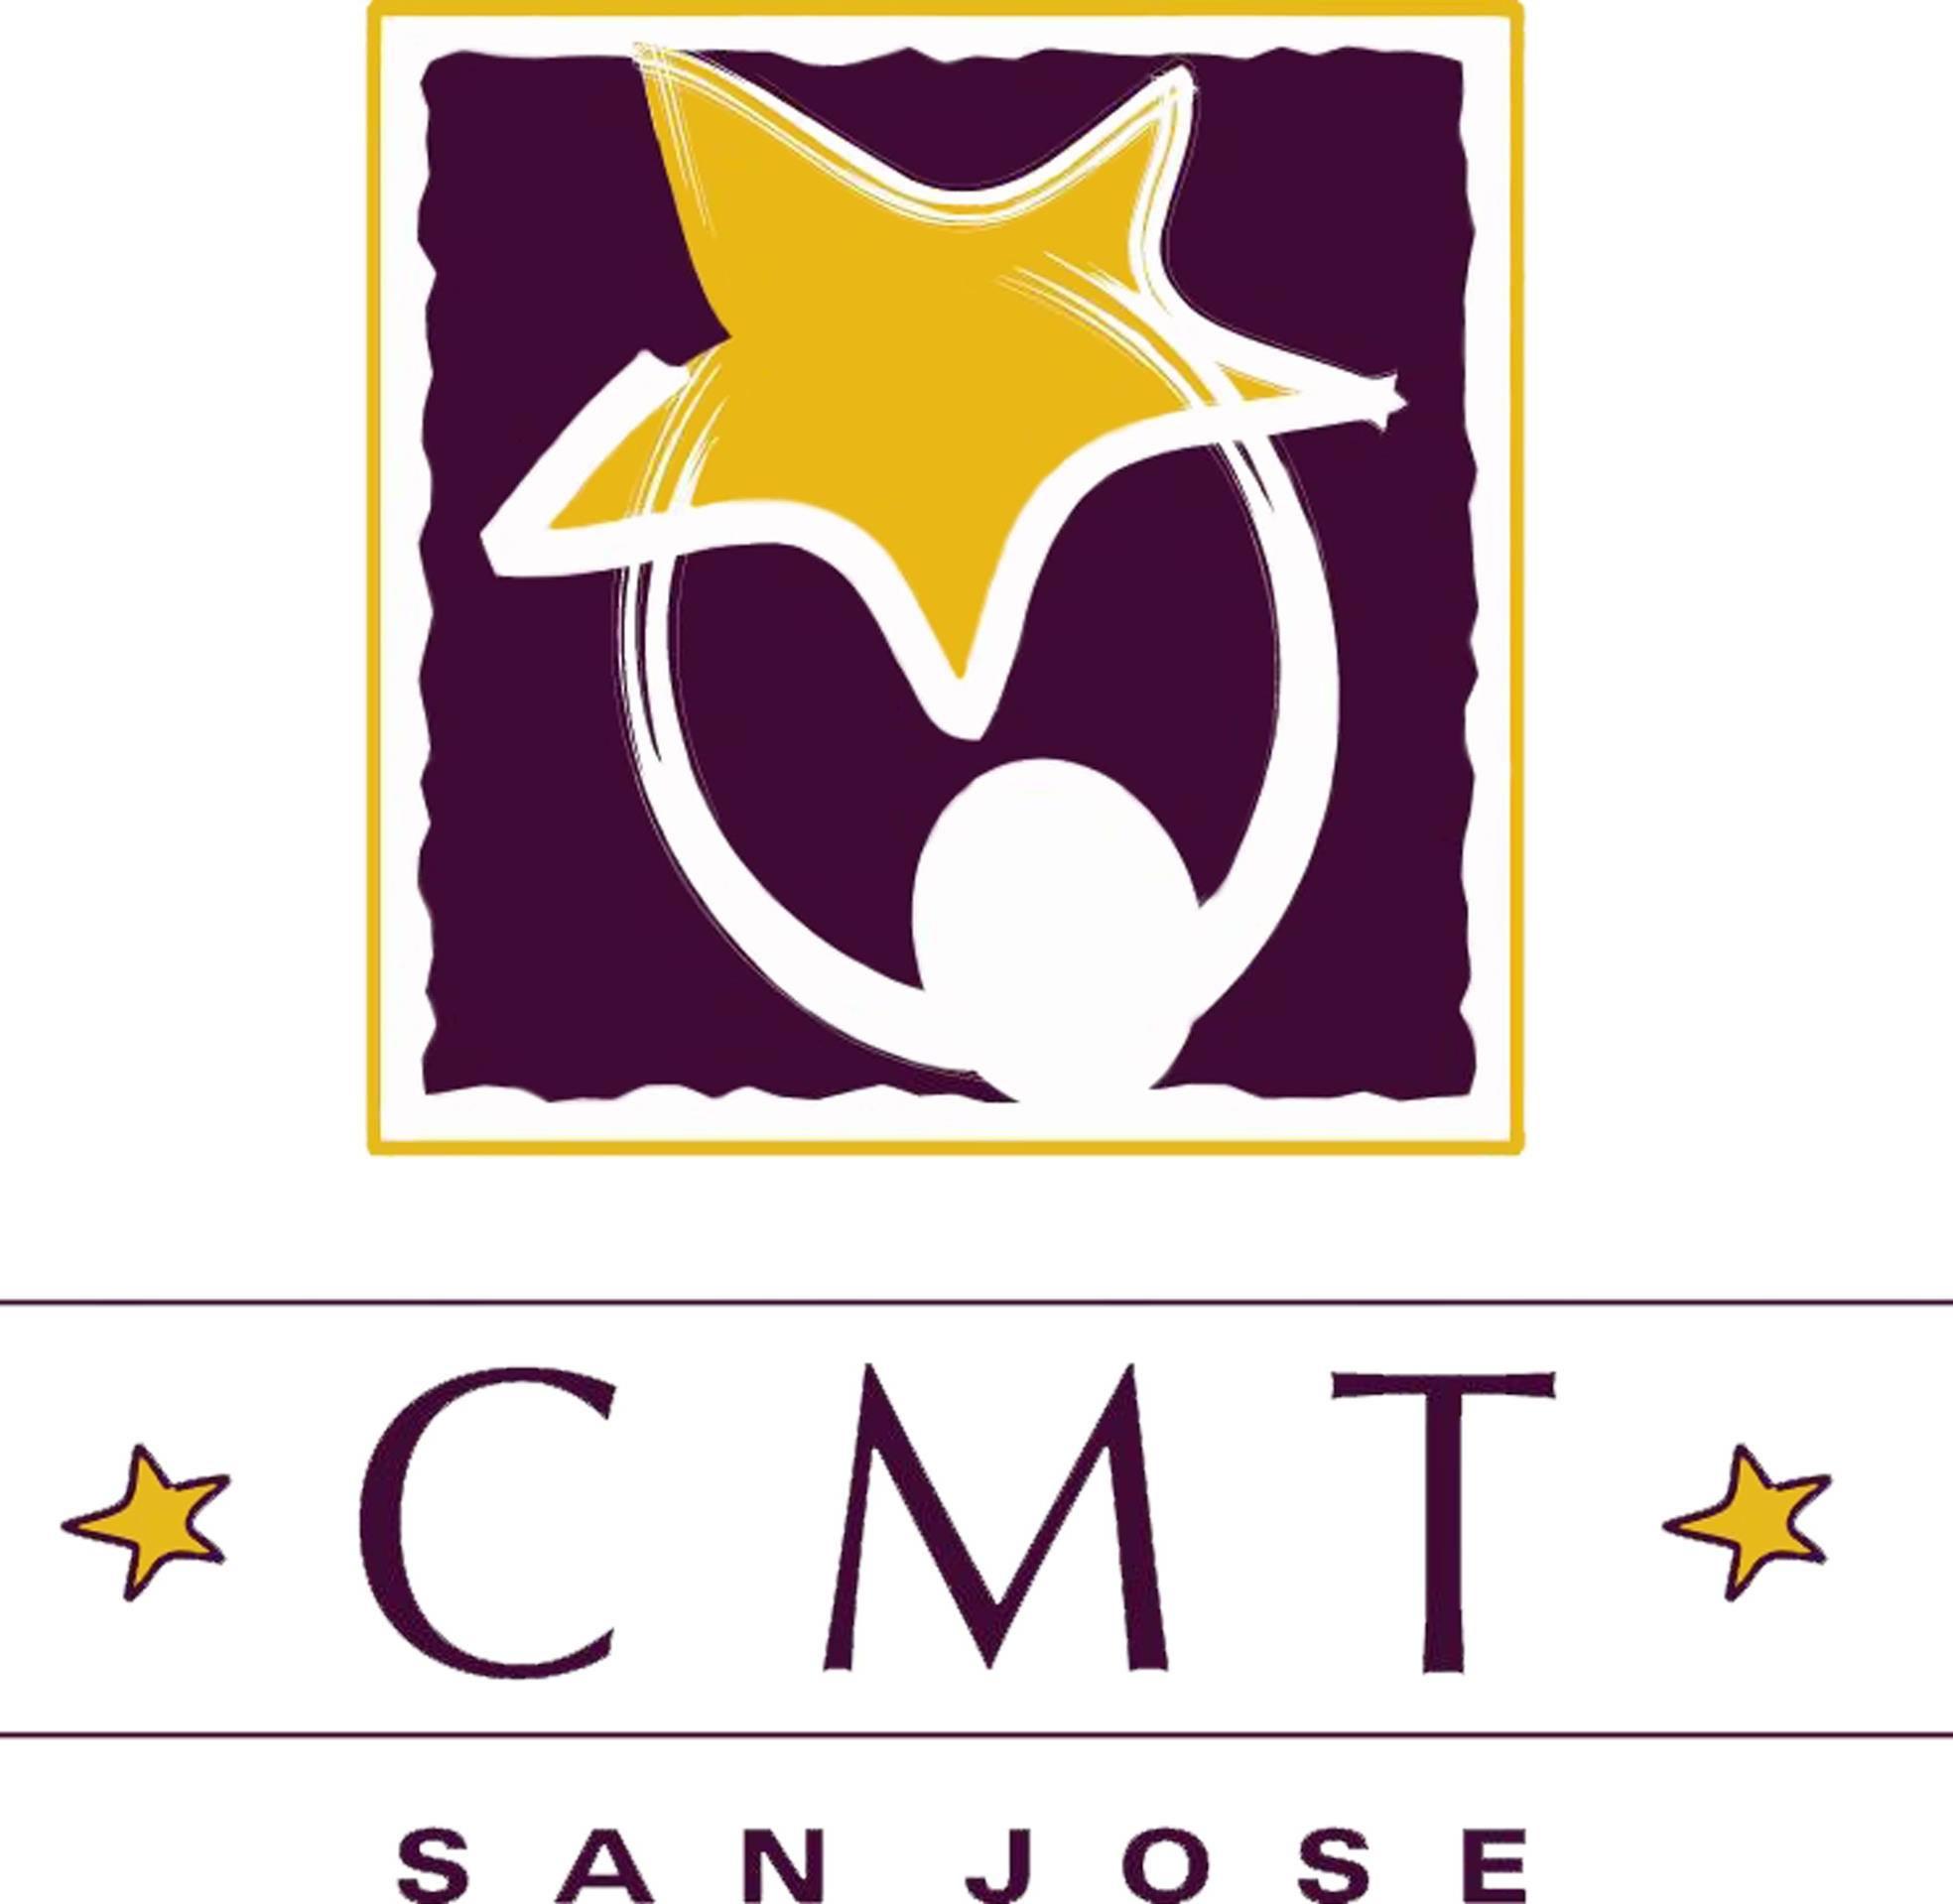 Former Dance Teacher and Choreographer Children's Musical Theater San Jose